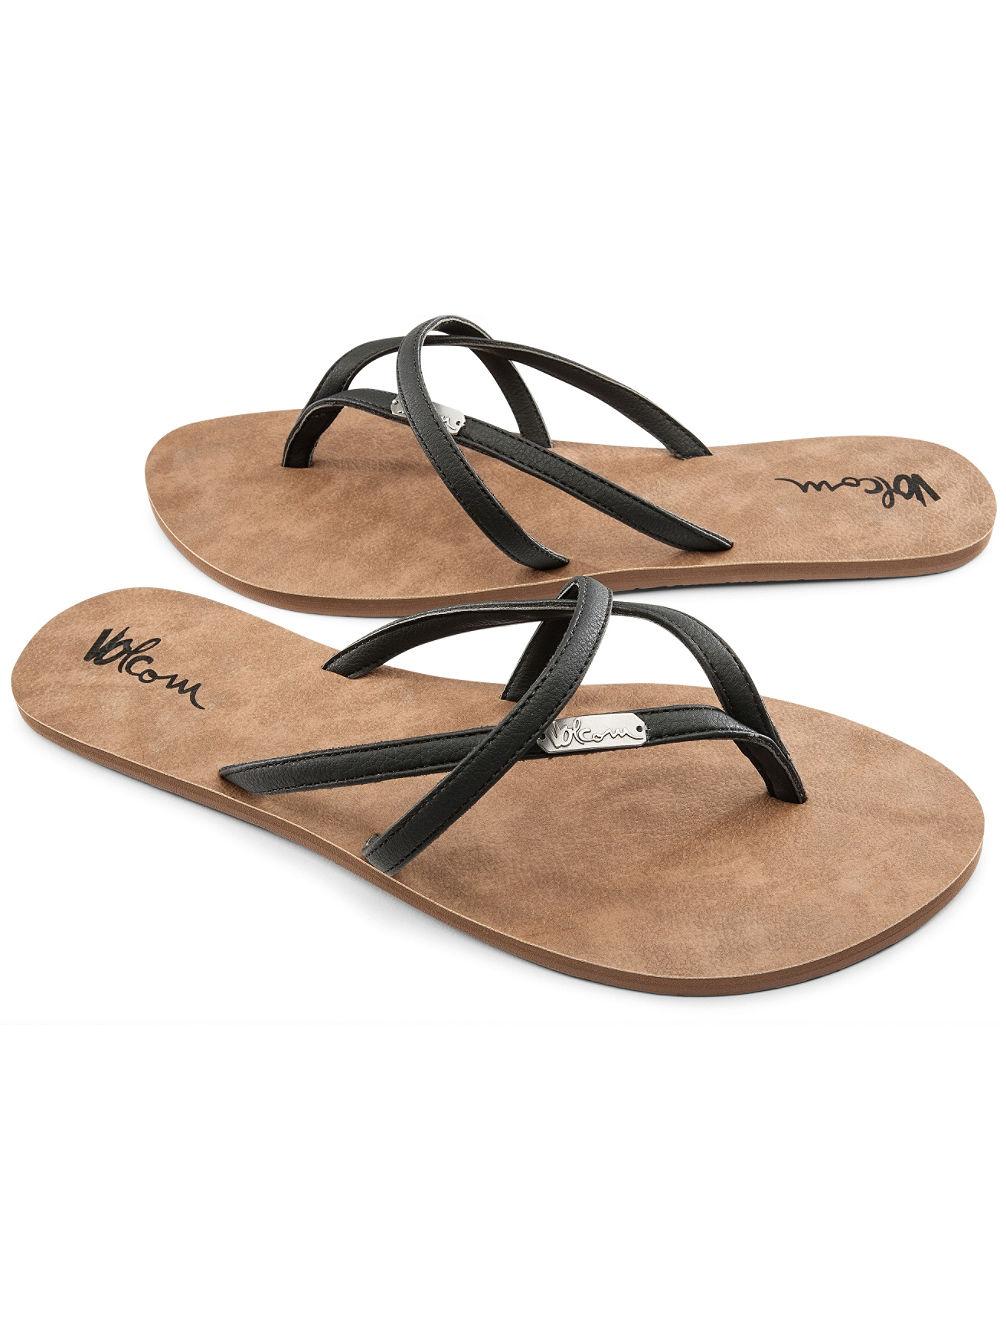 volcom-all-night-long-sandals-women